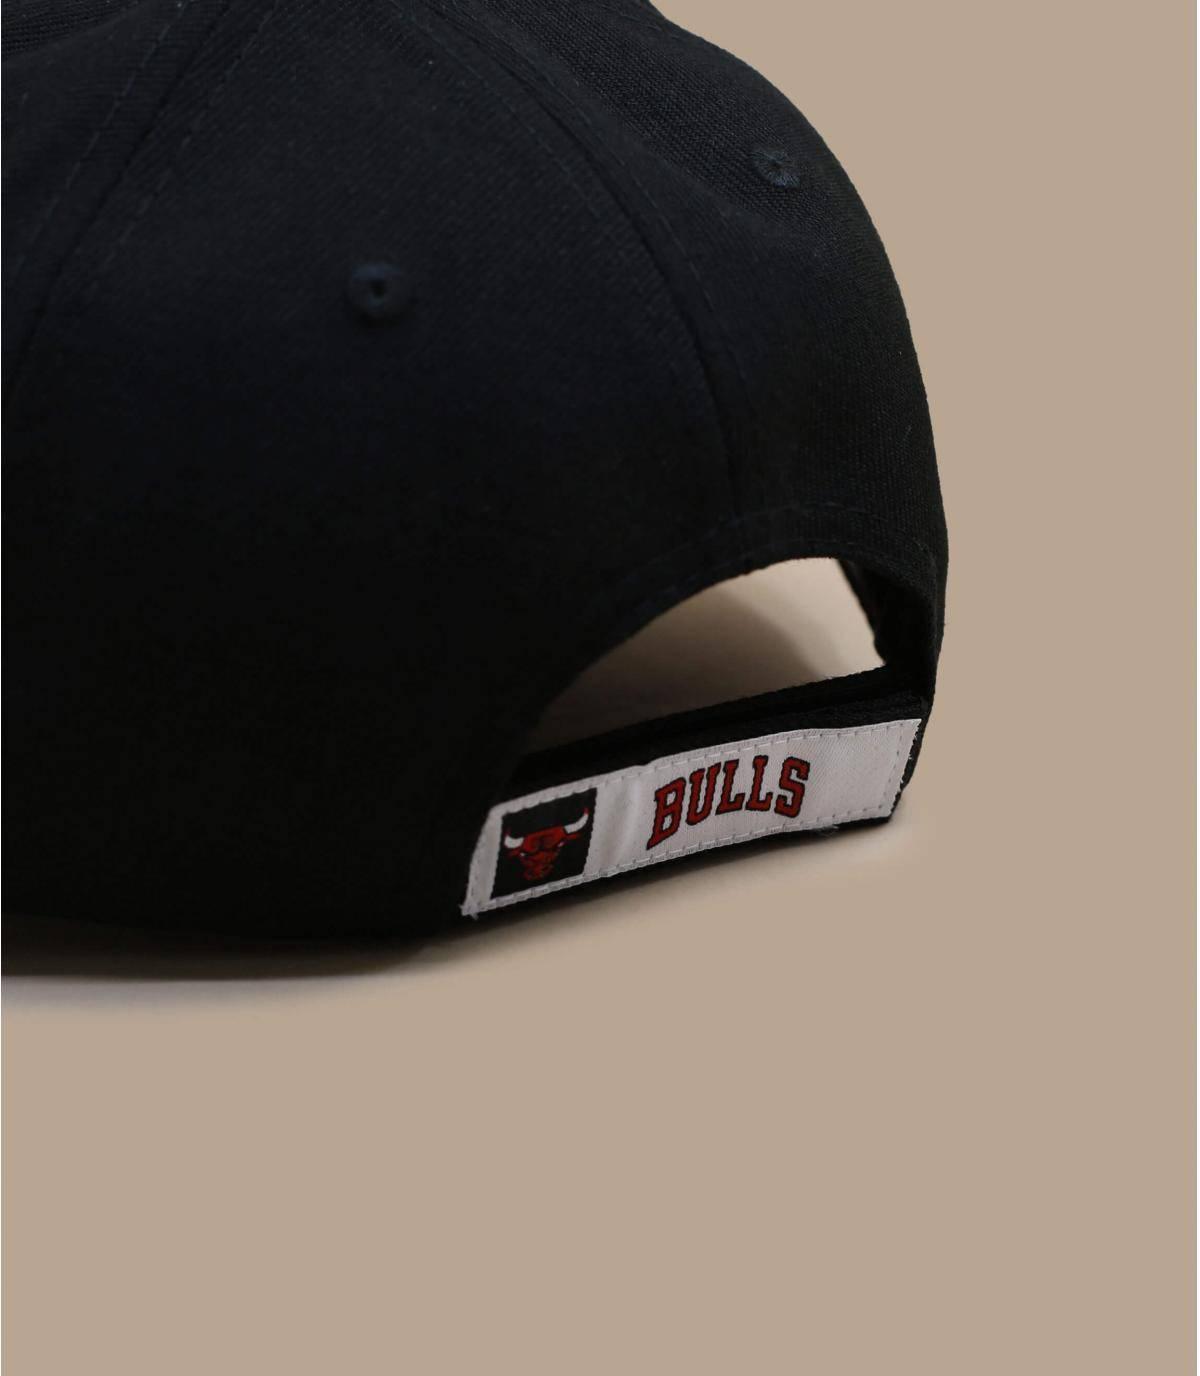 Details Kids NBA the League bulls - afbeeling 4